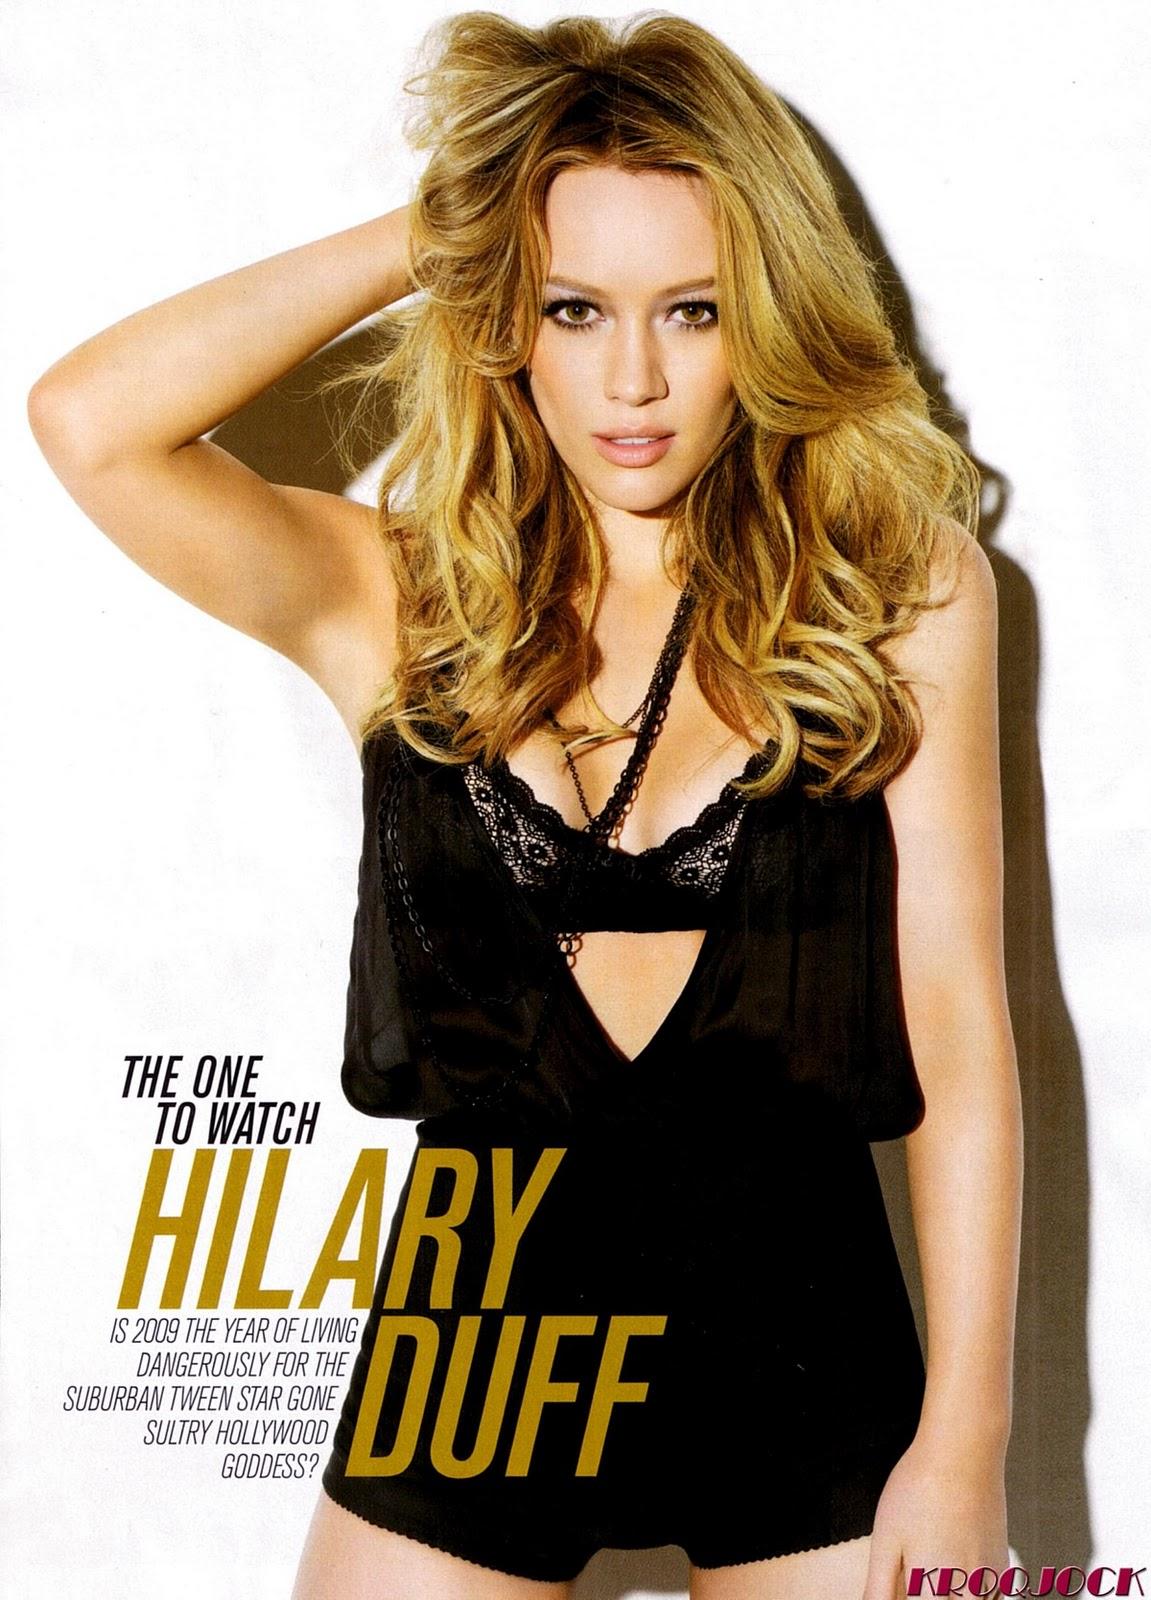 Top model sexy: Hilary Duff.......Born to be Super star Hilary Duff Facebook